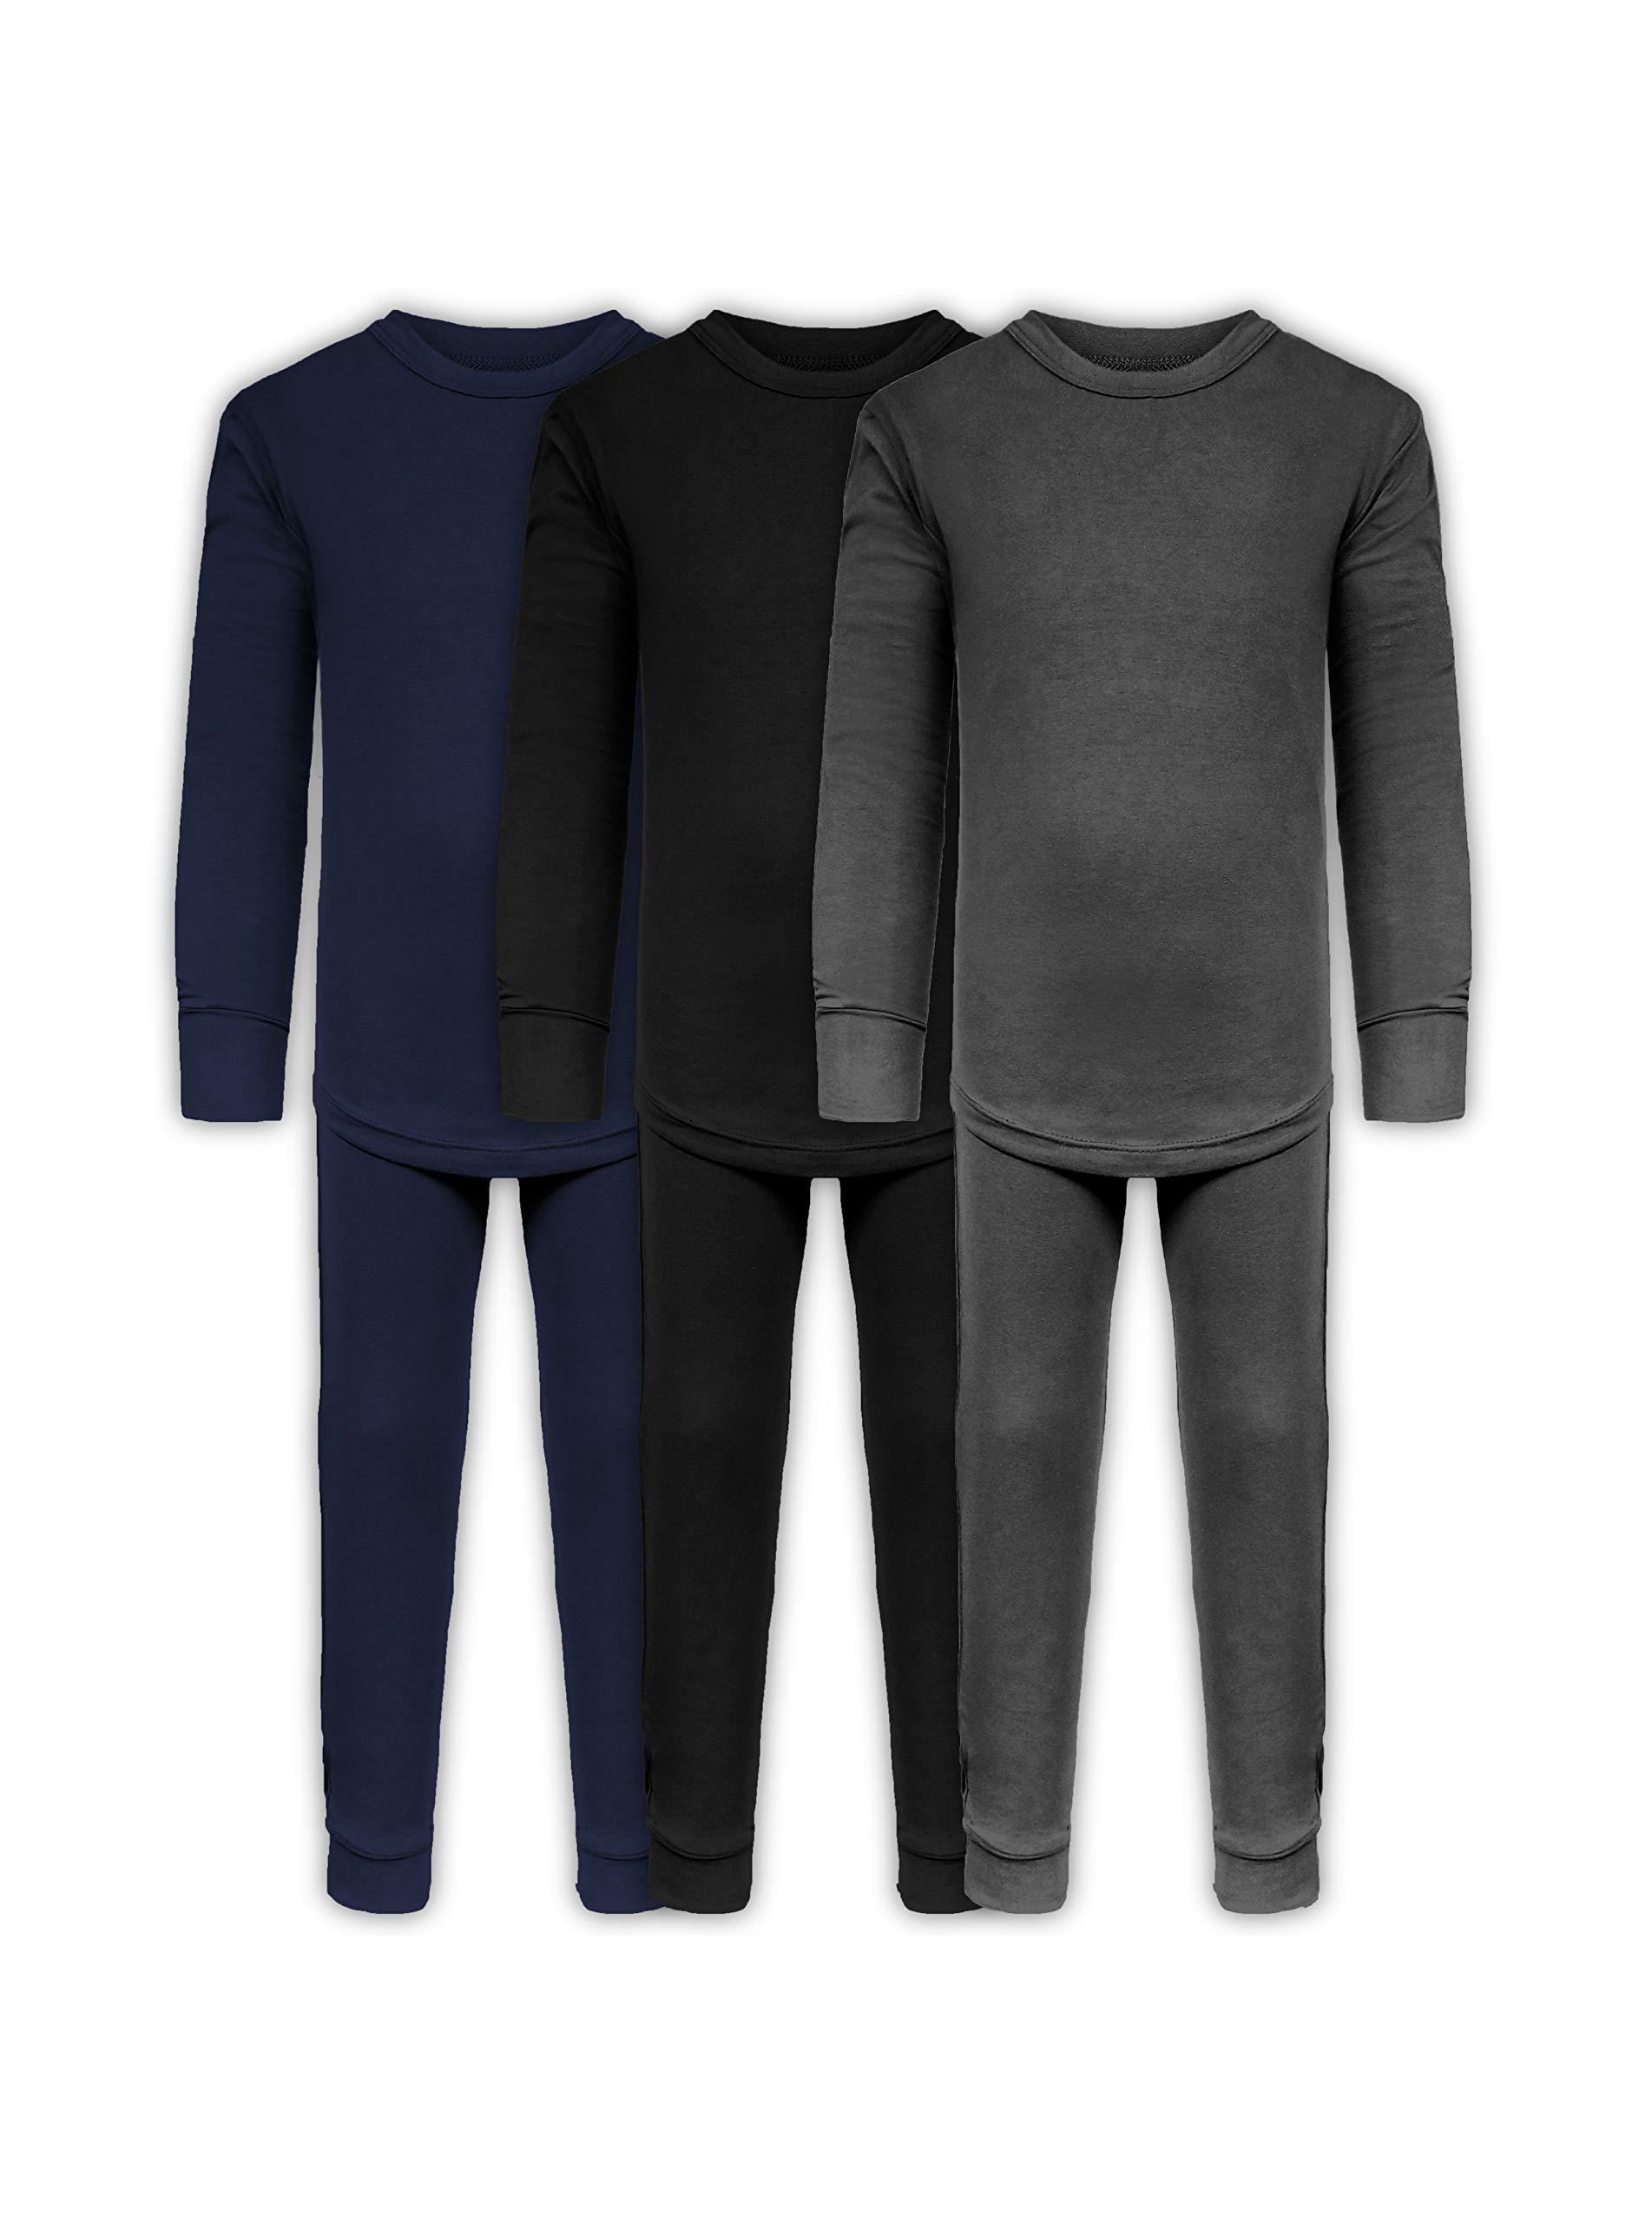 Boys Long John Ultra-Soft Cotton Stretch Base Layer Underwear Sets / 3 Long Sleeve Tops + 3 Long Pants - 6 Piece Mix & Match (3 Sets / 6 Pc - Black/Grey/Navy, 7) by ANDREW SCOTT